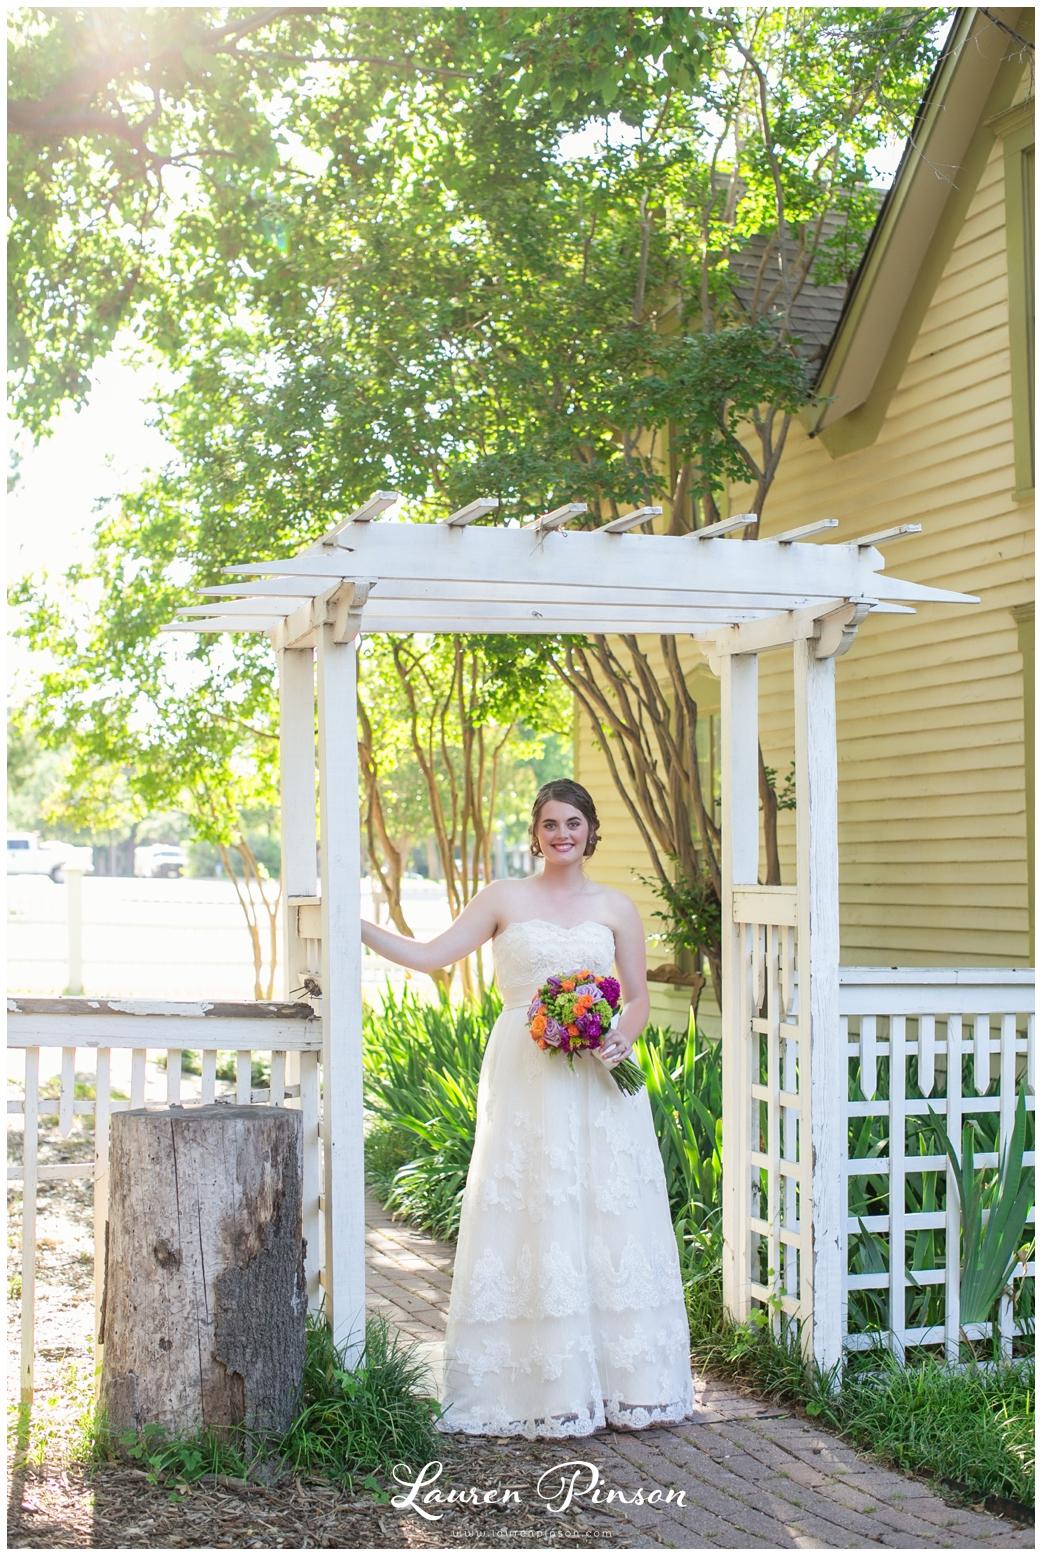 chestnut-square-downtown-mckinney-texas-wedding-photographer-sherman-northtexas-bridal-portraits-photography_0207.jpg